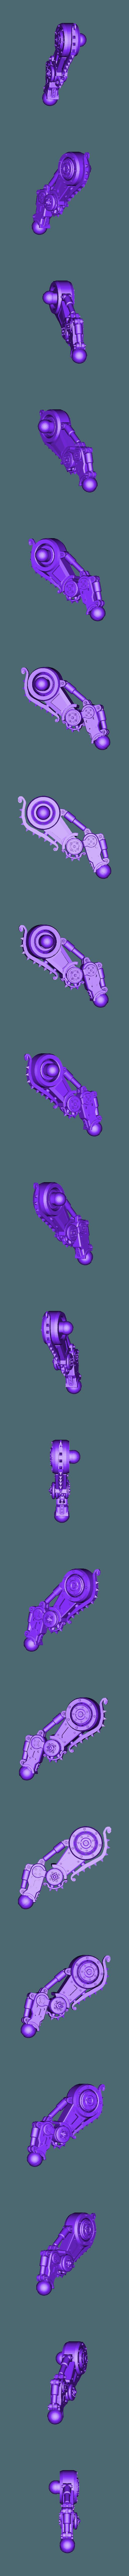 Penny 2.0 Leg 1.stl Download STL file Penny Nun Bot 2.0 • 3D print model, Leesedrenfort